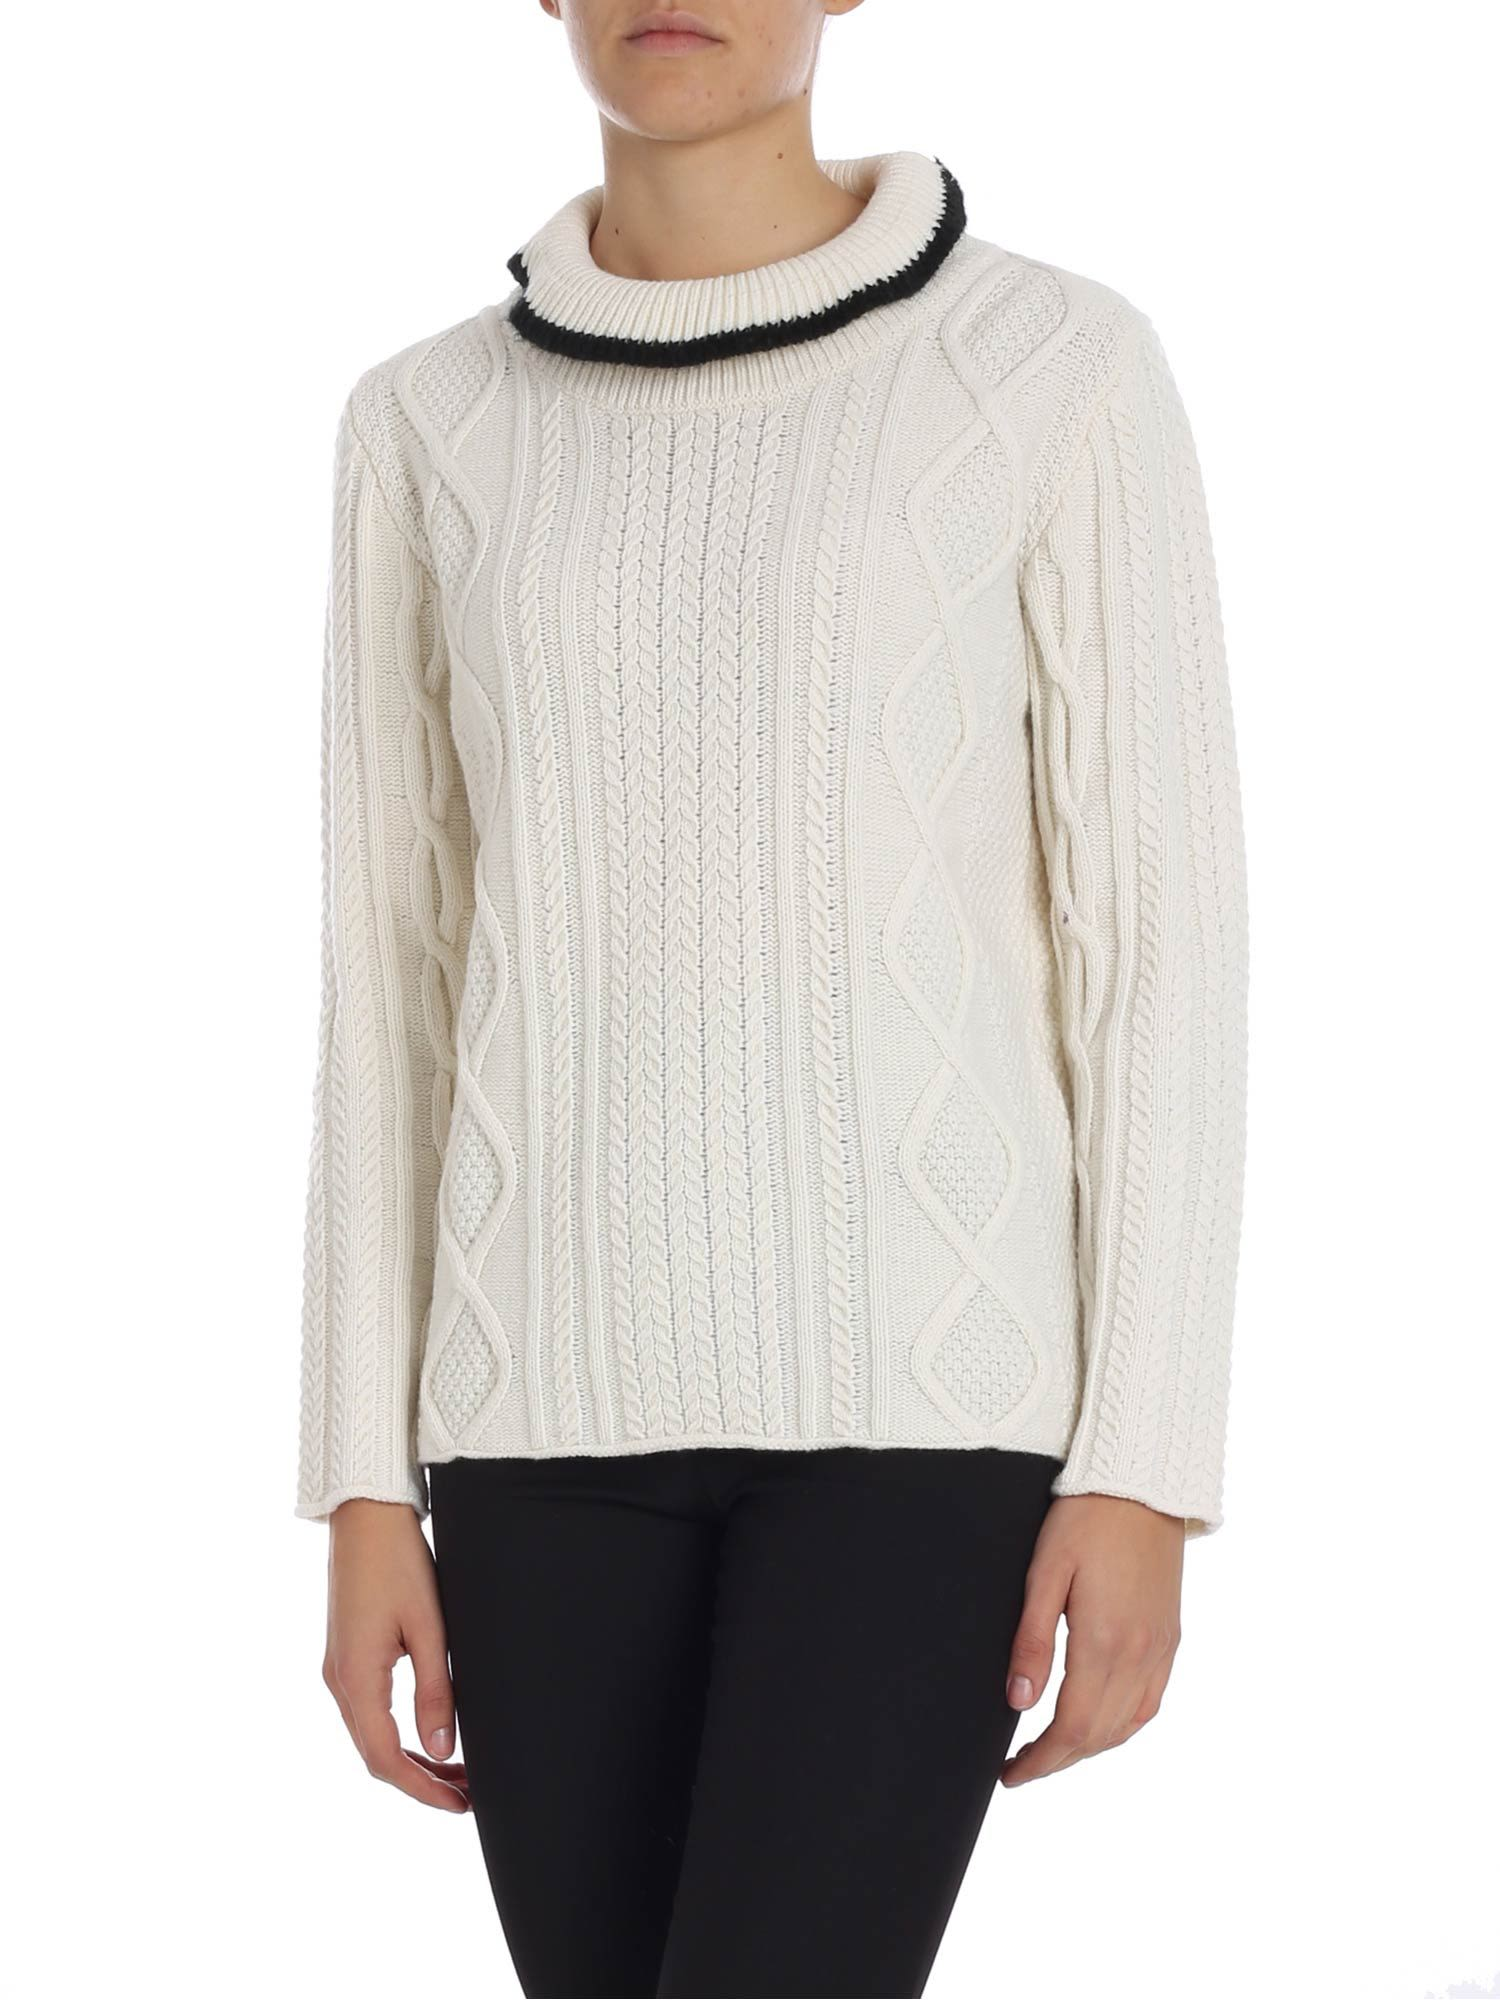 ALTEA High Collar Sweater in Cream